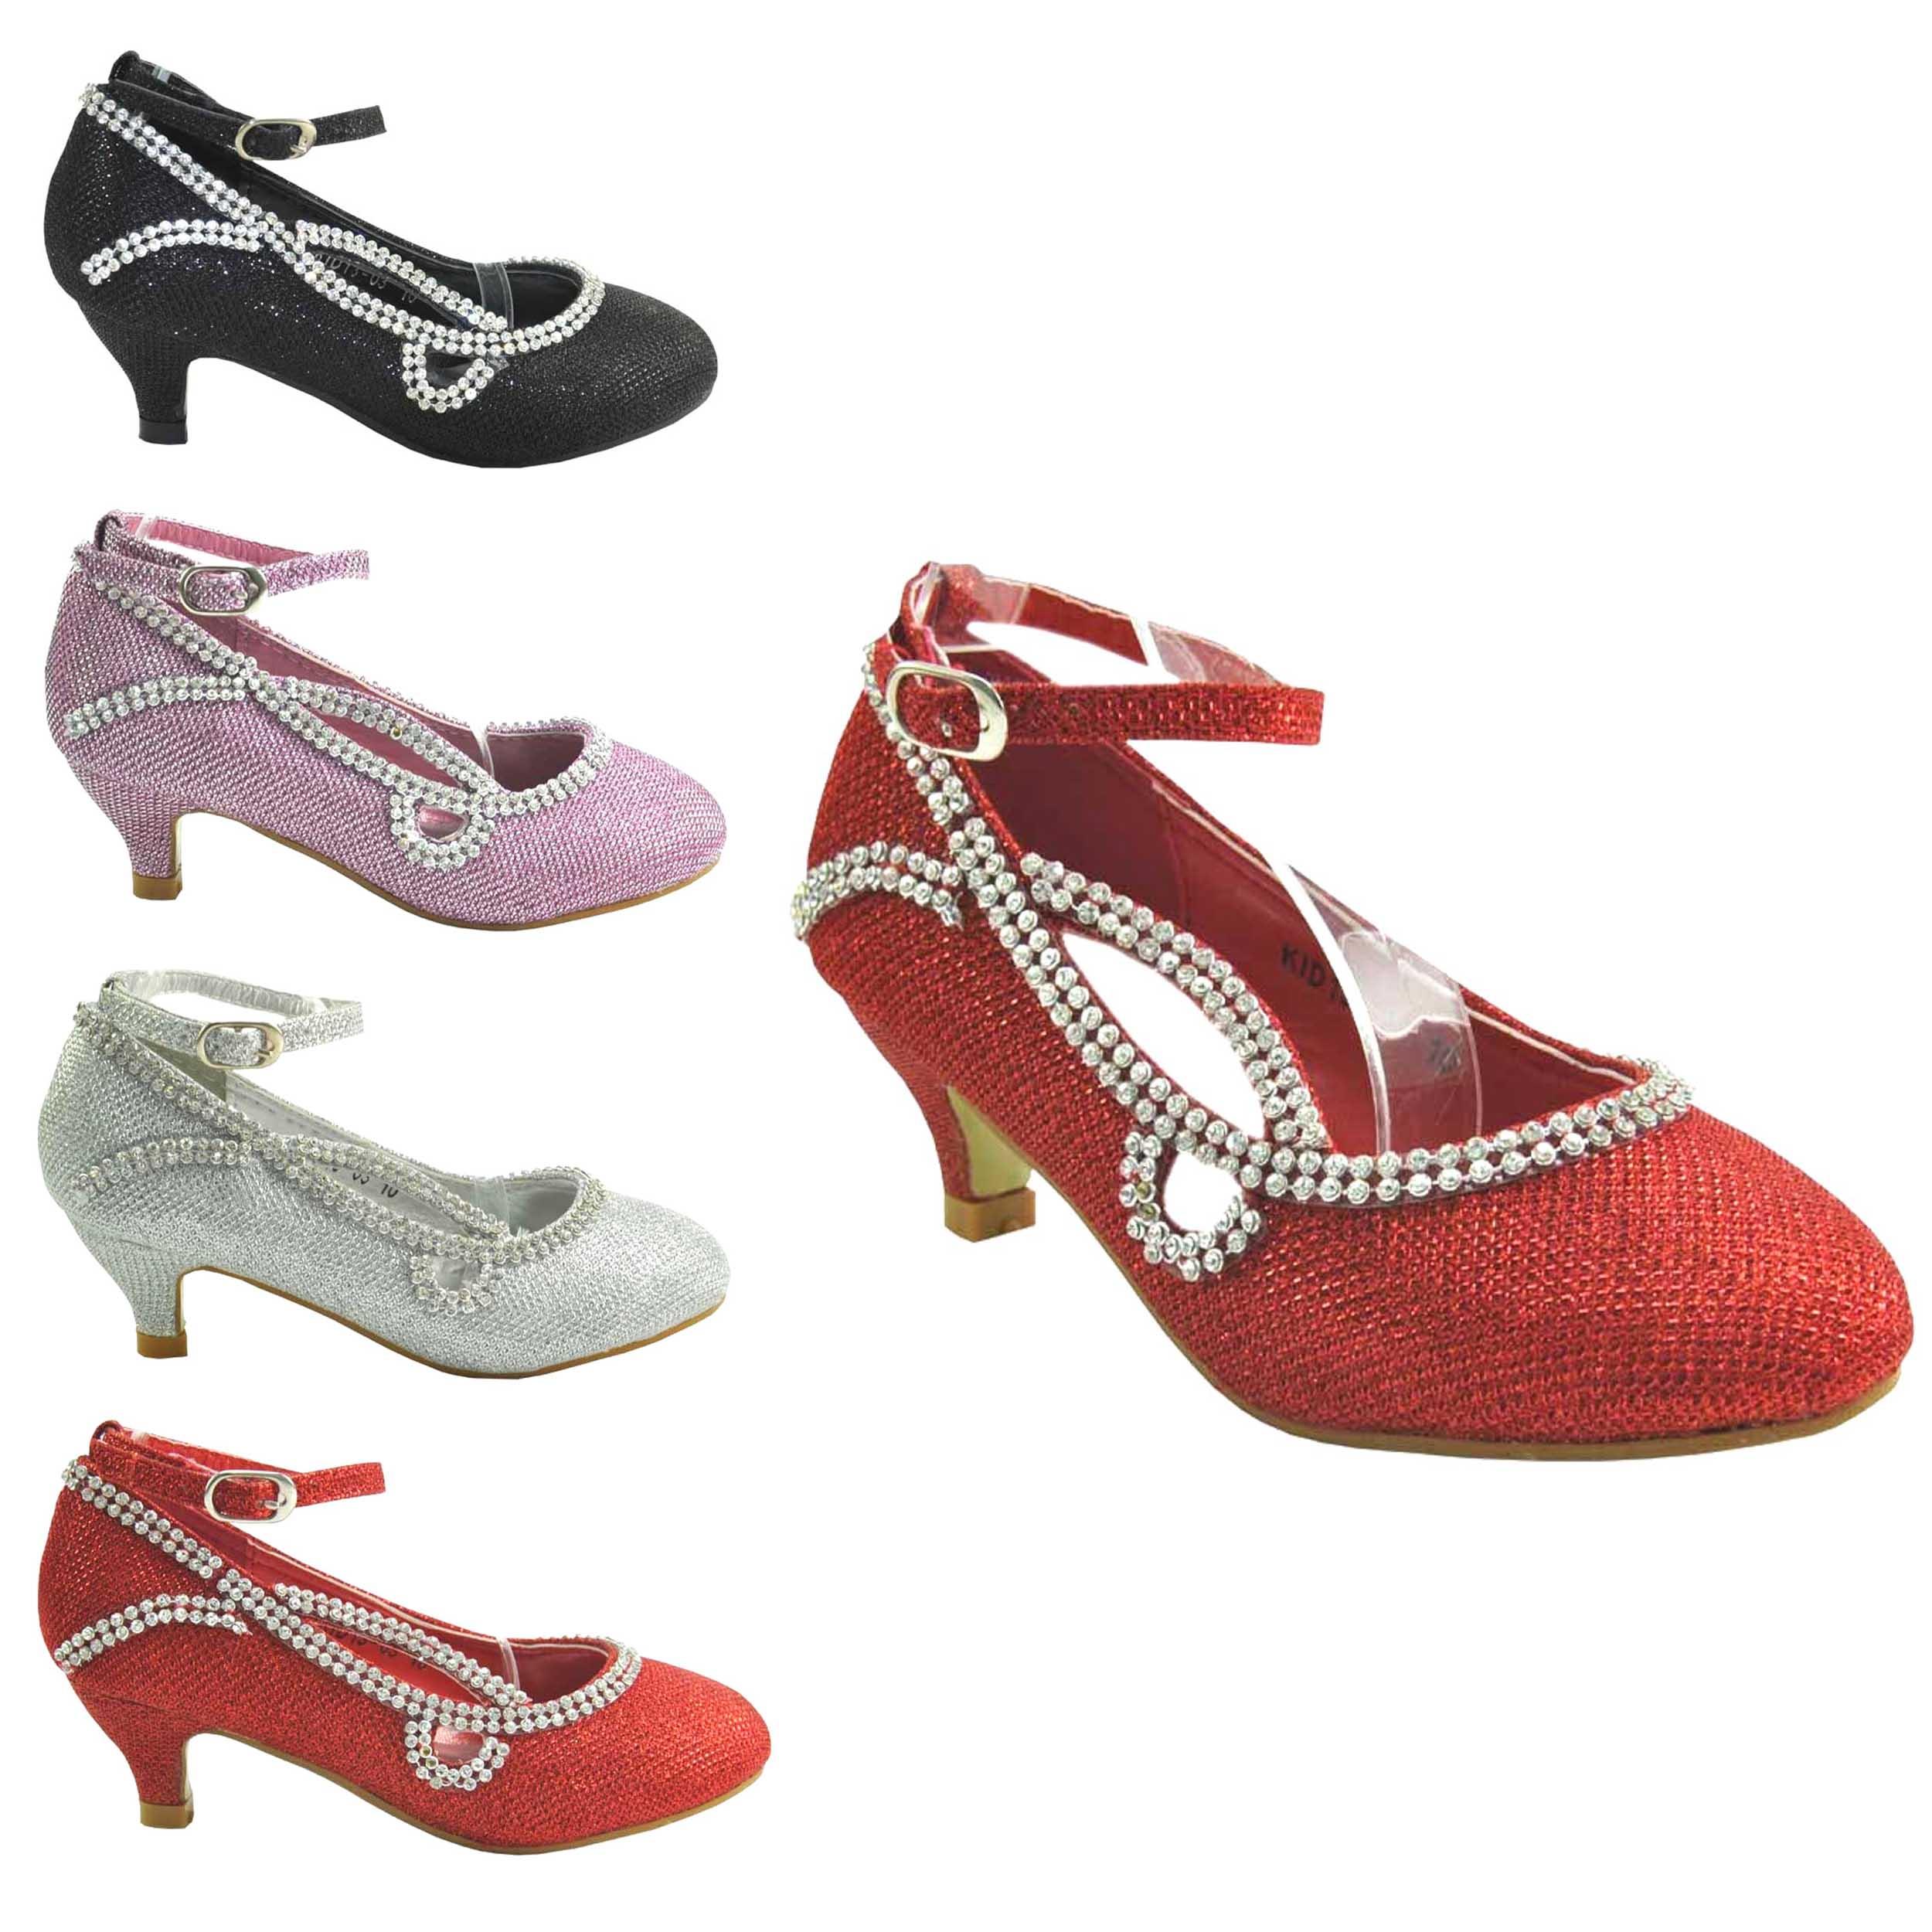 High Heels Shoes For Kids Size 13 Heel formal shoes size 8-2High Heels Shoes For Kids Size 13